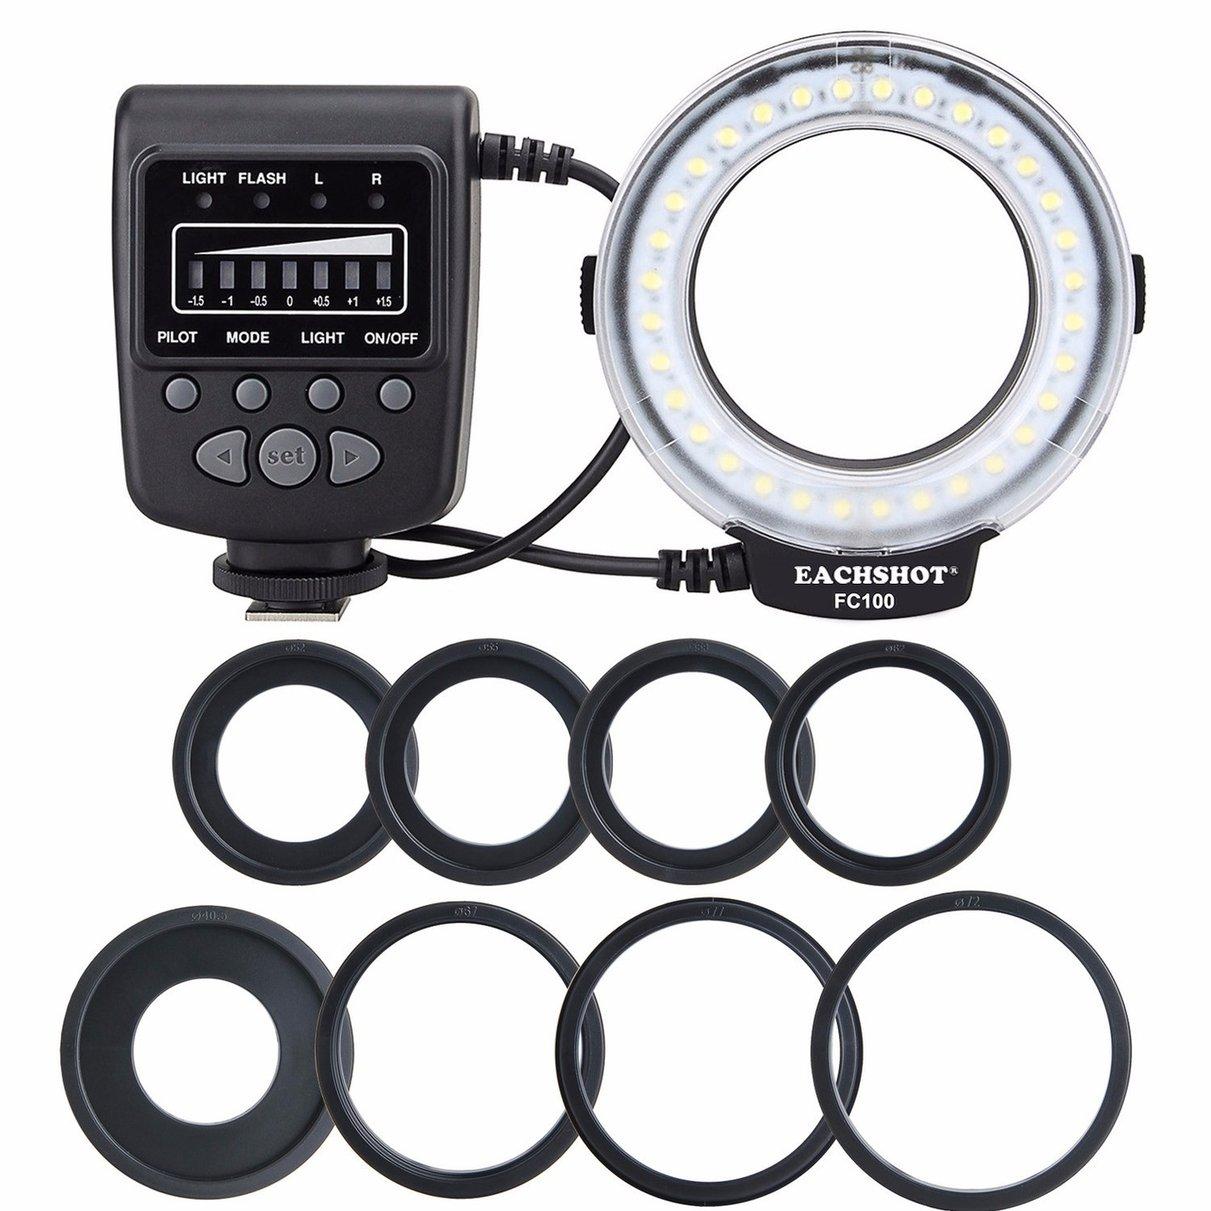 Meike FC-100 FC100 Macro Ring Flash/Light MK FC 100 for Canon for EOS 650D 600D 60D 7D 550D 1100D T5i T4i T3i T3